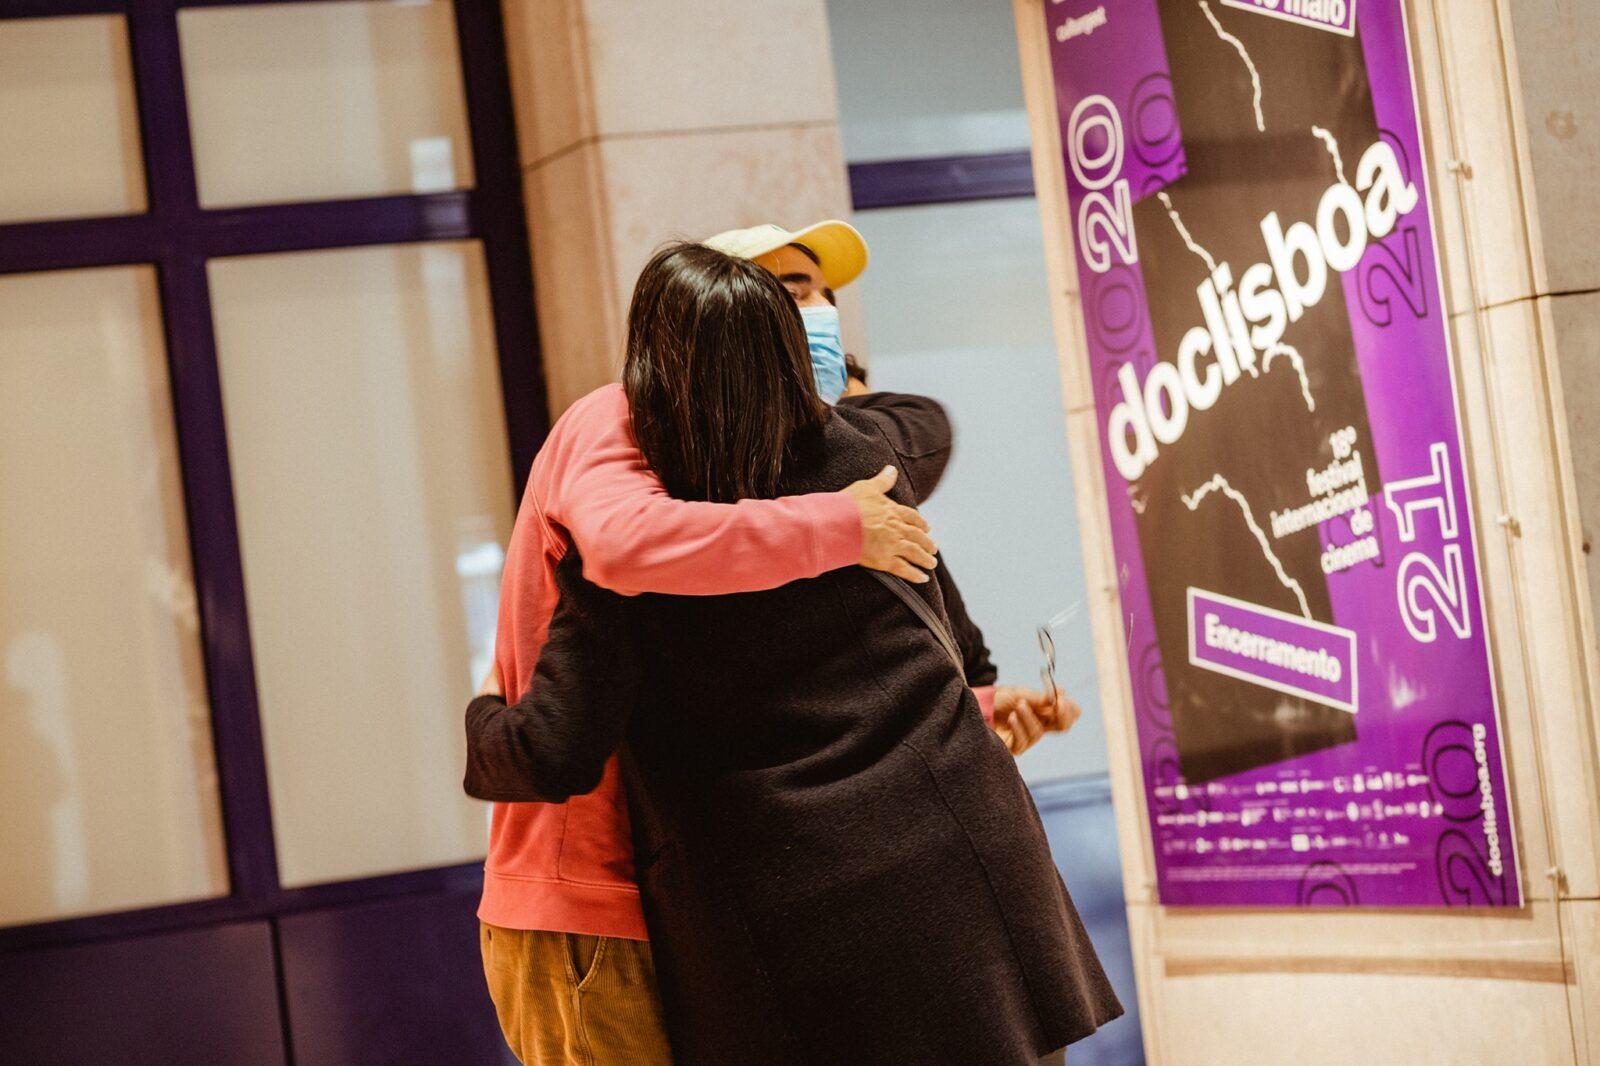 Doclisboa hug